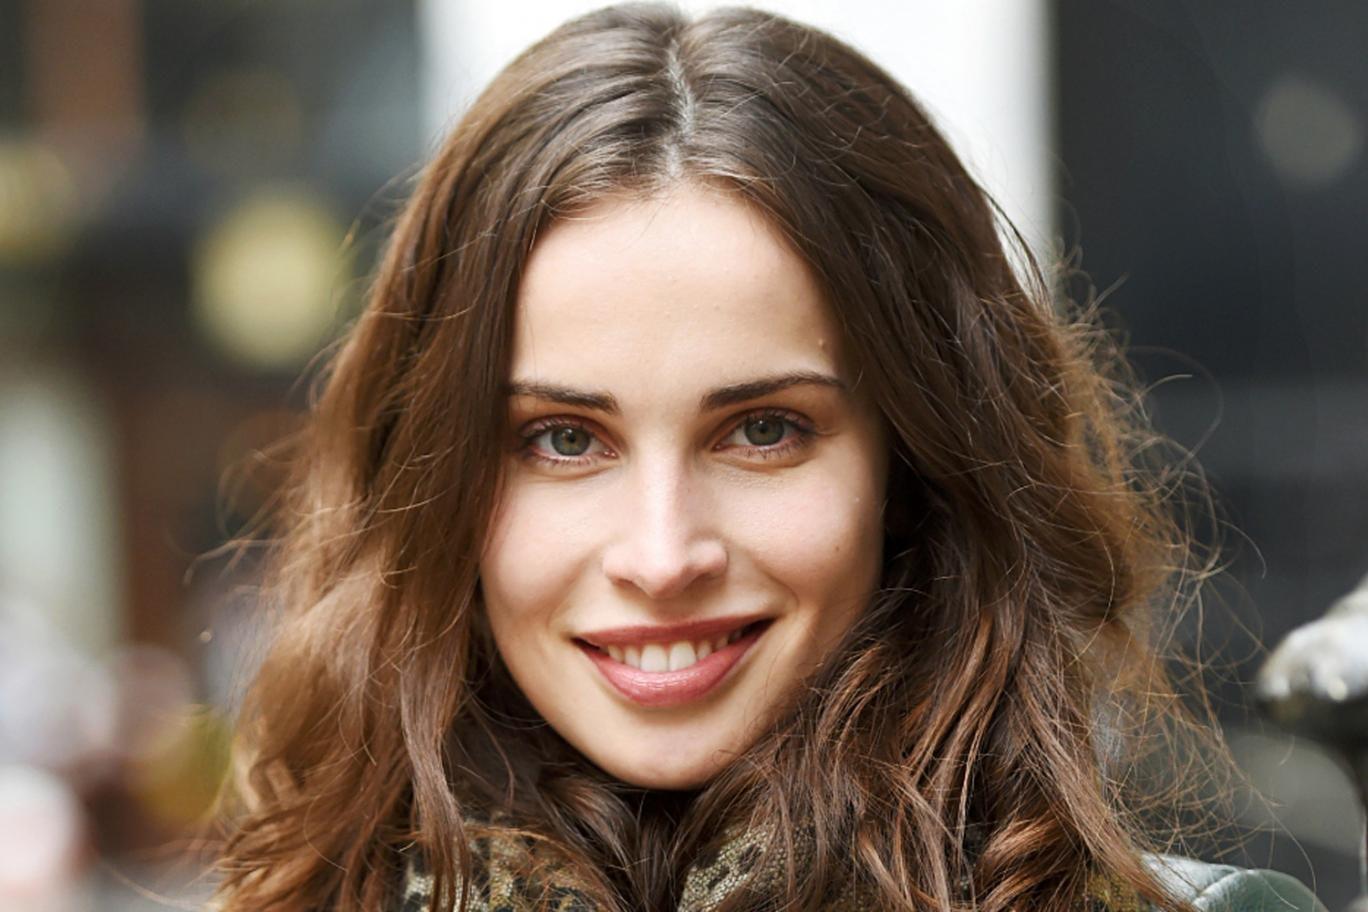 Heida Reed, Icelandic actress from Poldark